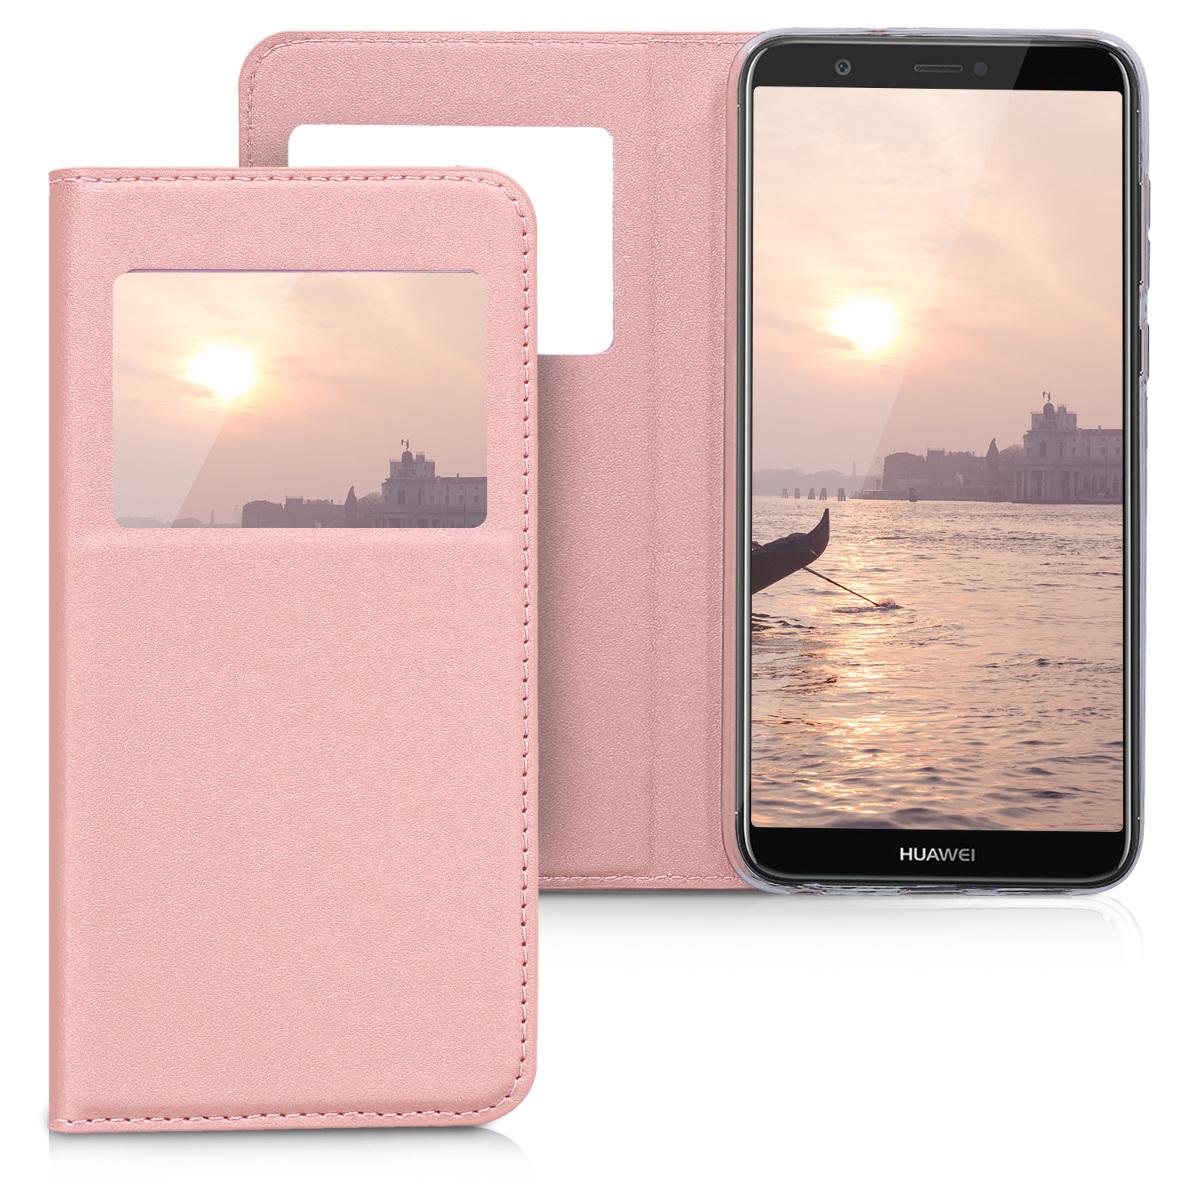 KW Θήκη-Flip Huawei P Smart - Ροζ (44207.81)